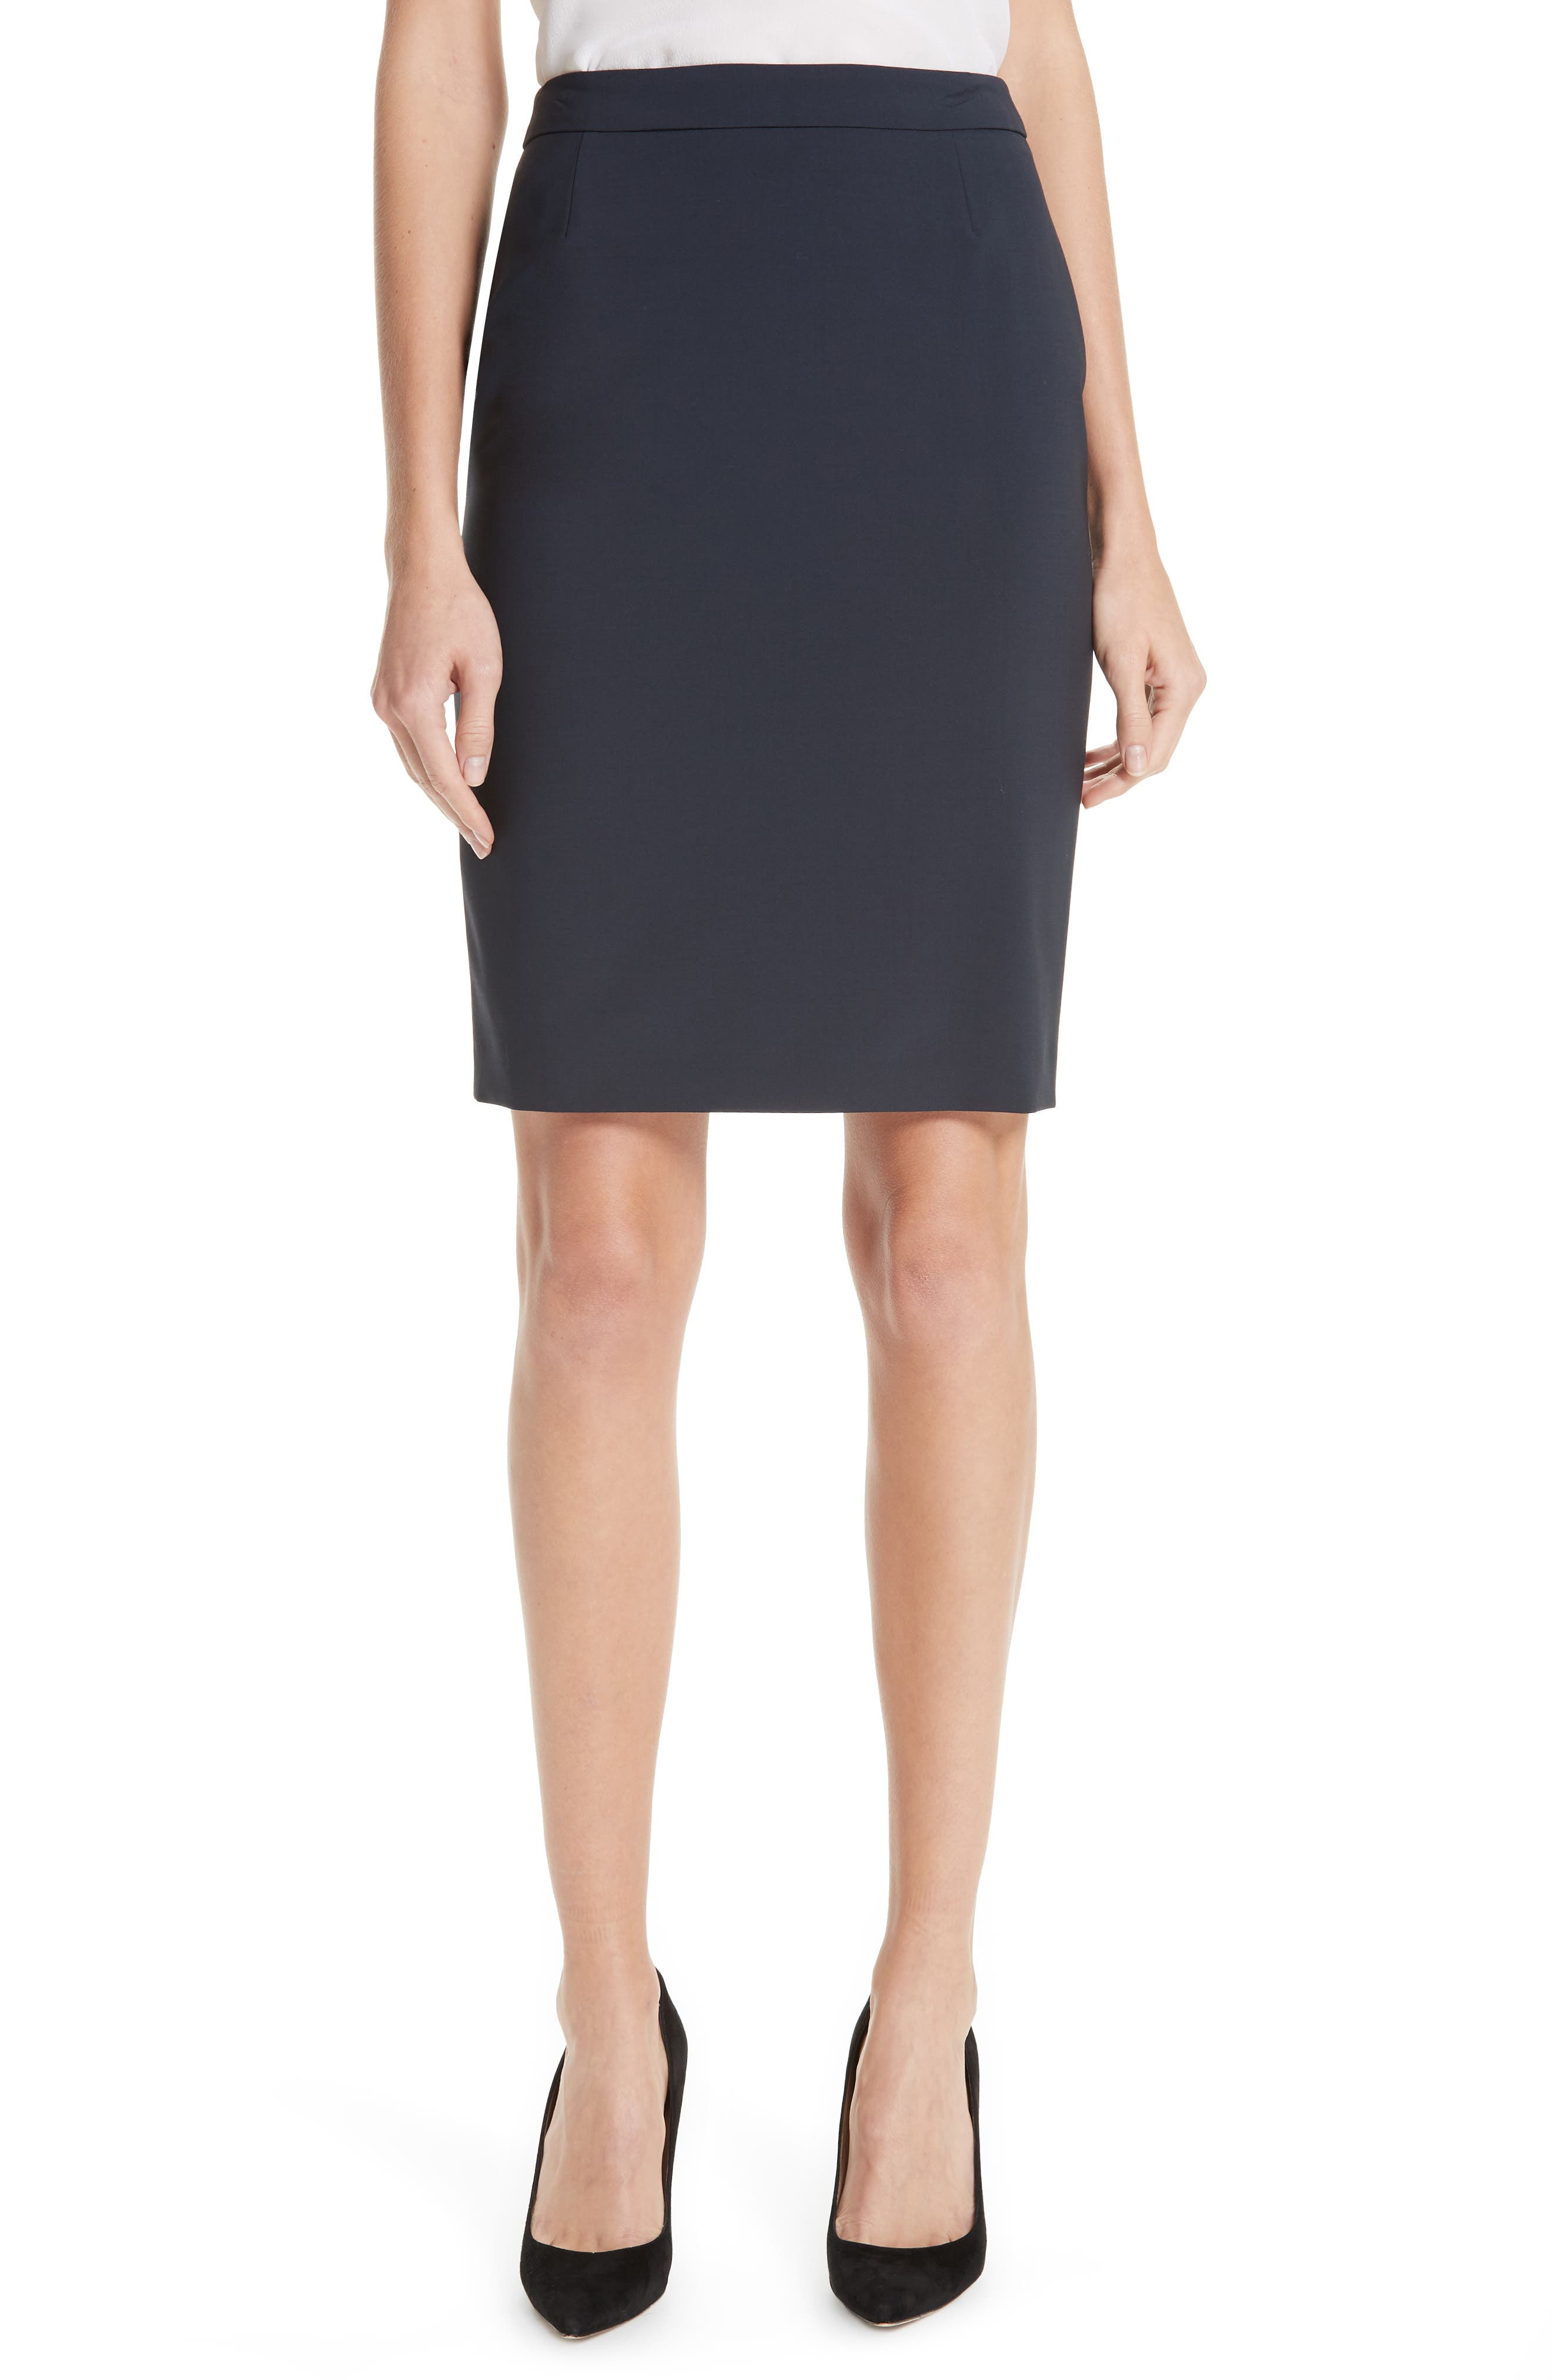 BOSS, Vilea Tropical Stretch Wool Pencil Skirt, Main thumbnail 1, color, NAVY